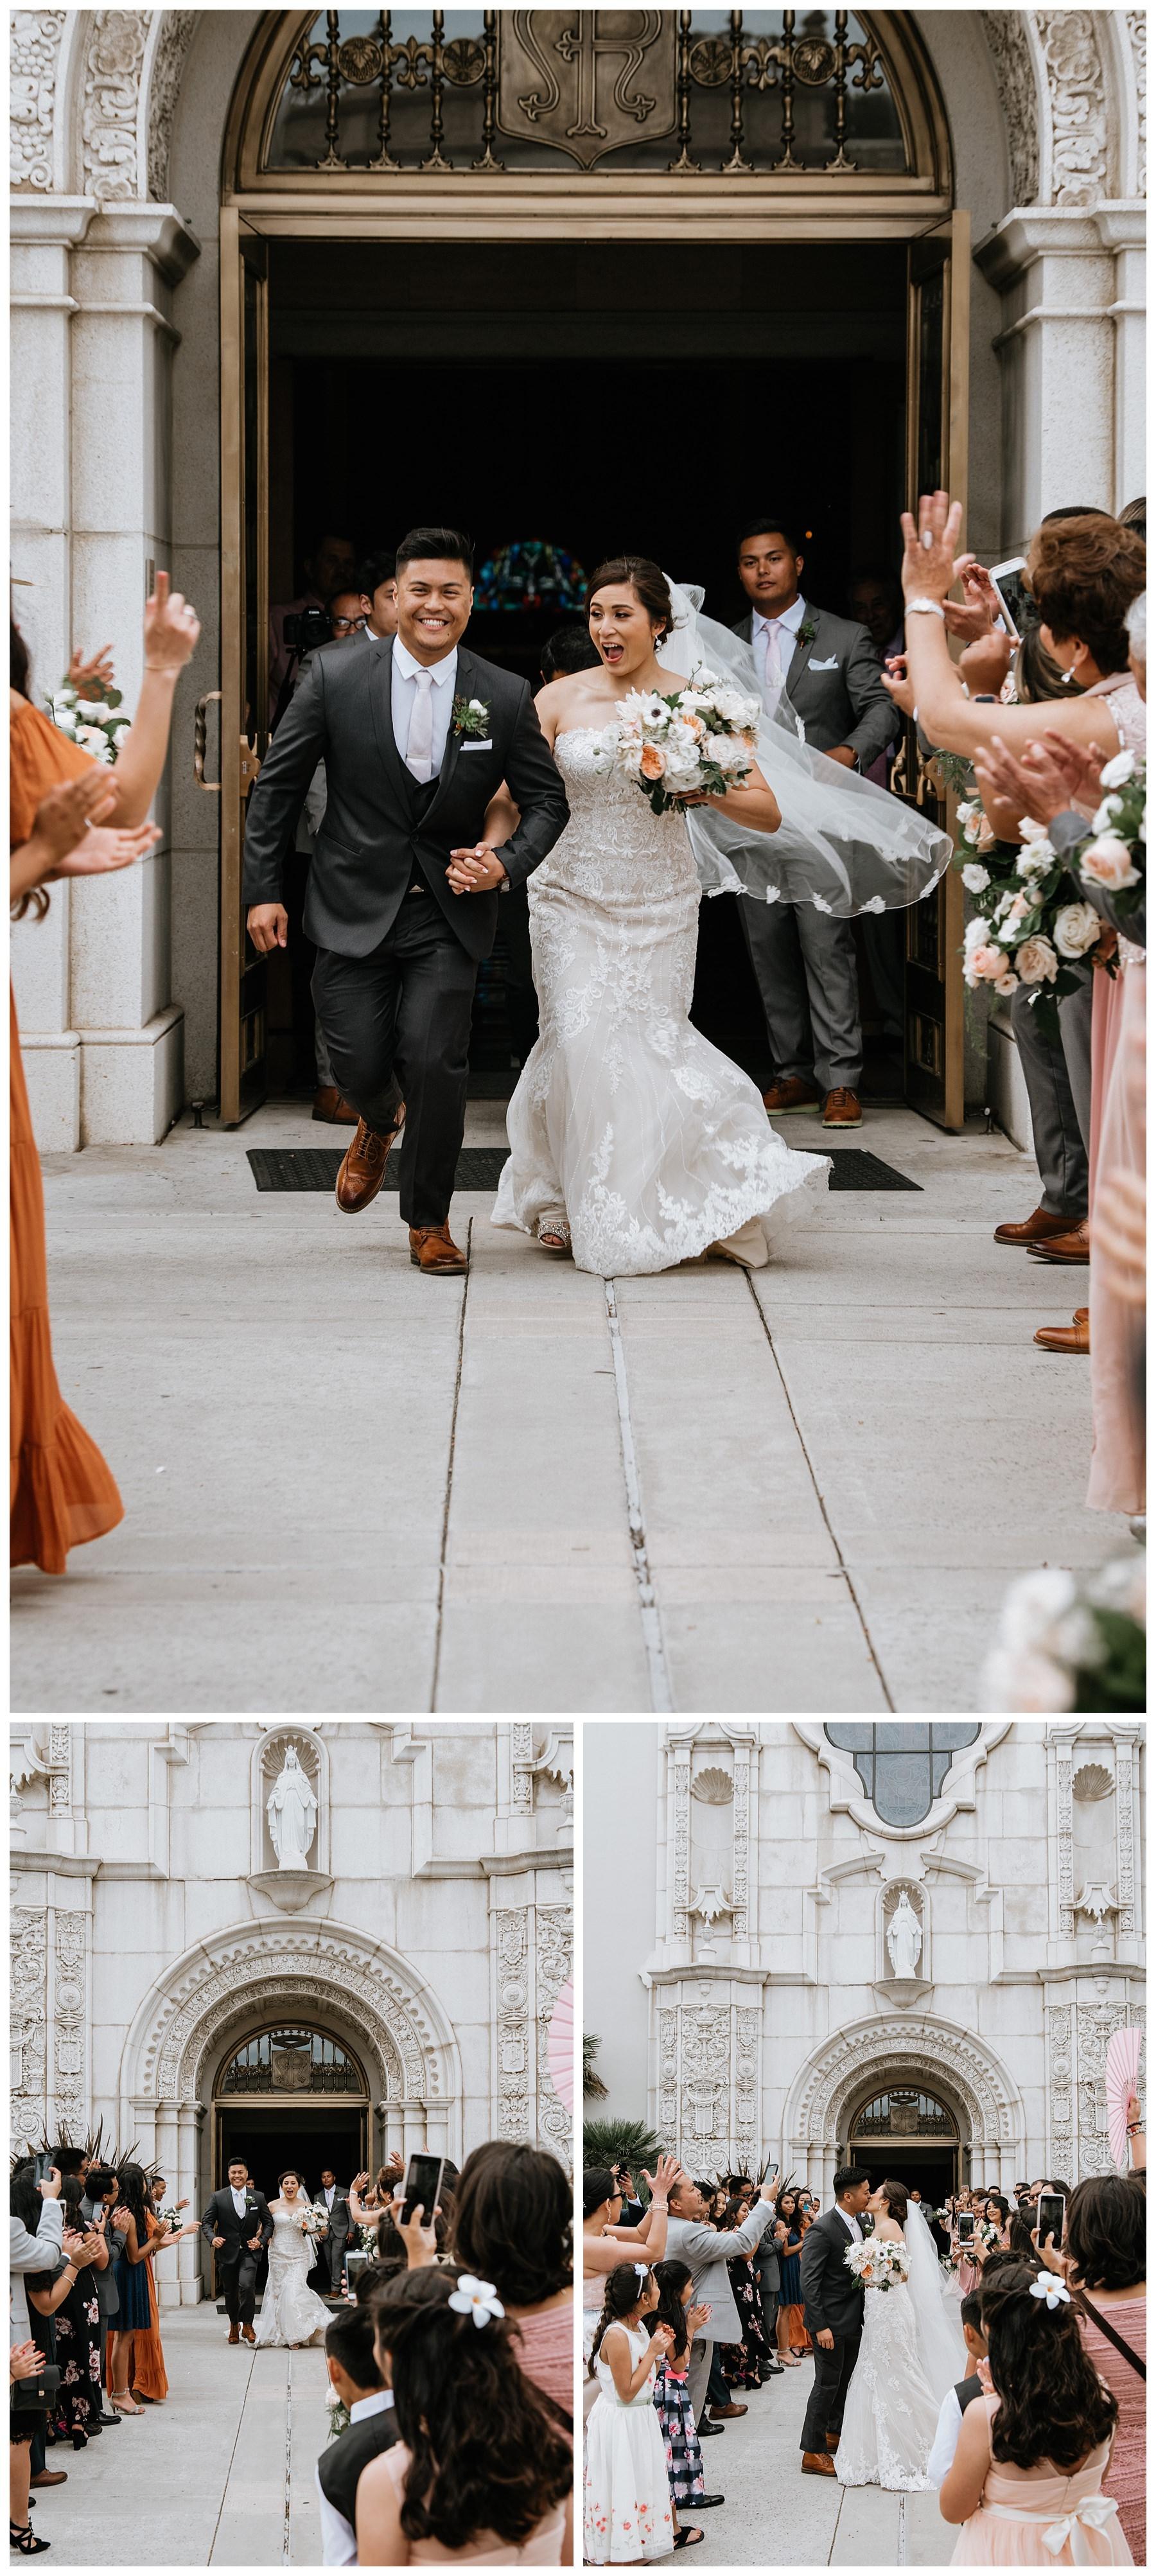 Brick_San_Diego_wedding_0028.jpg